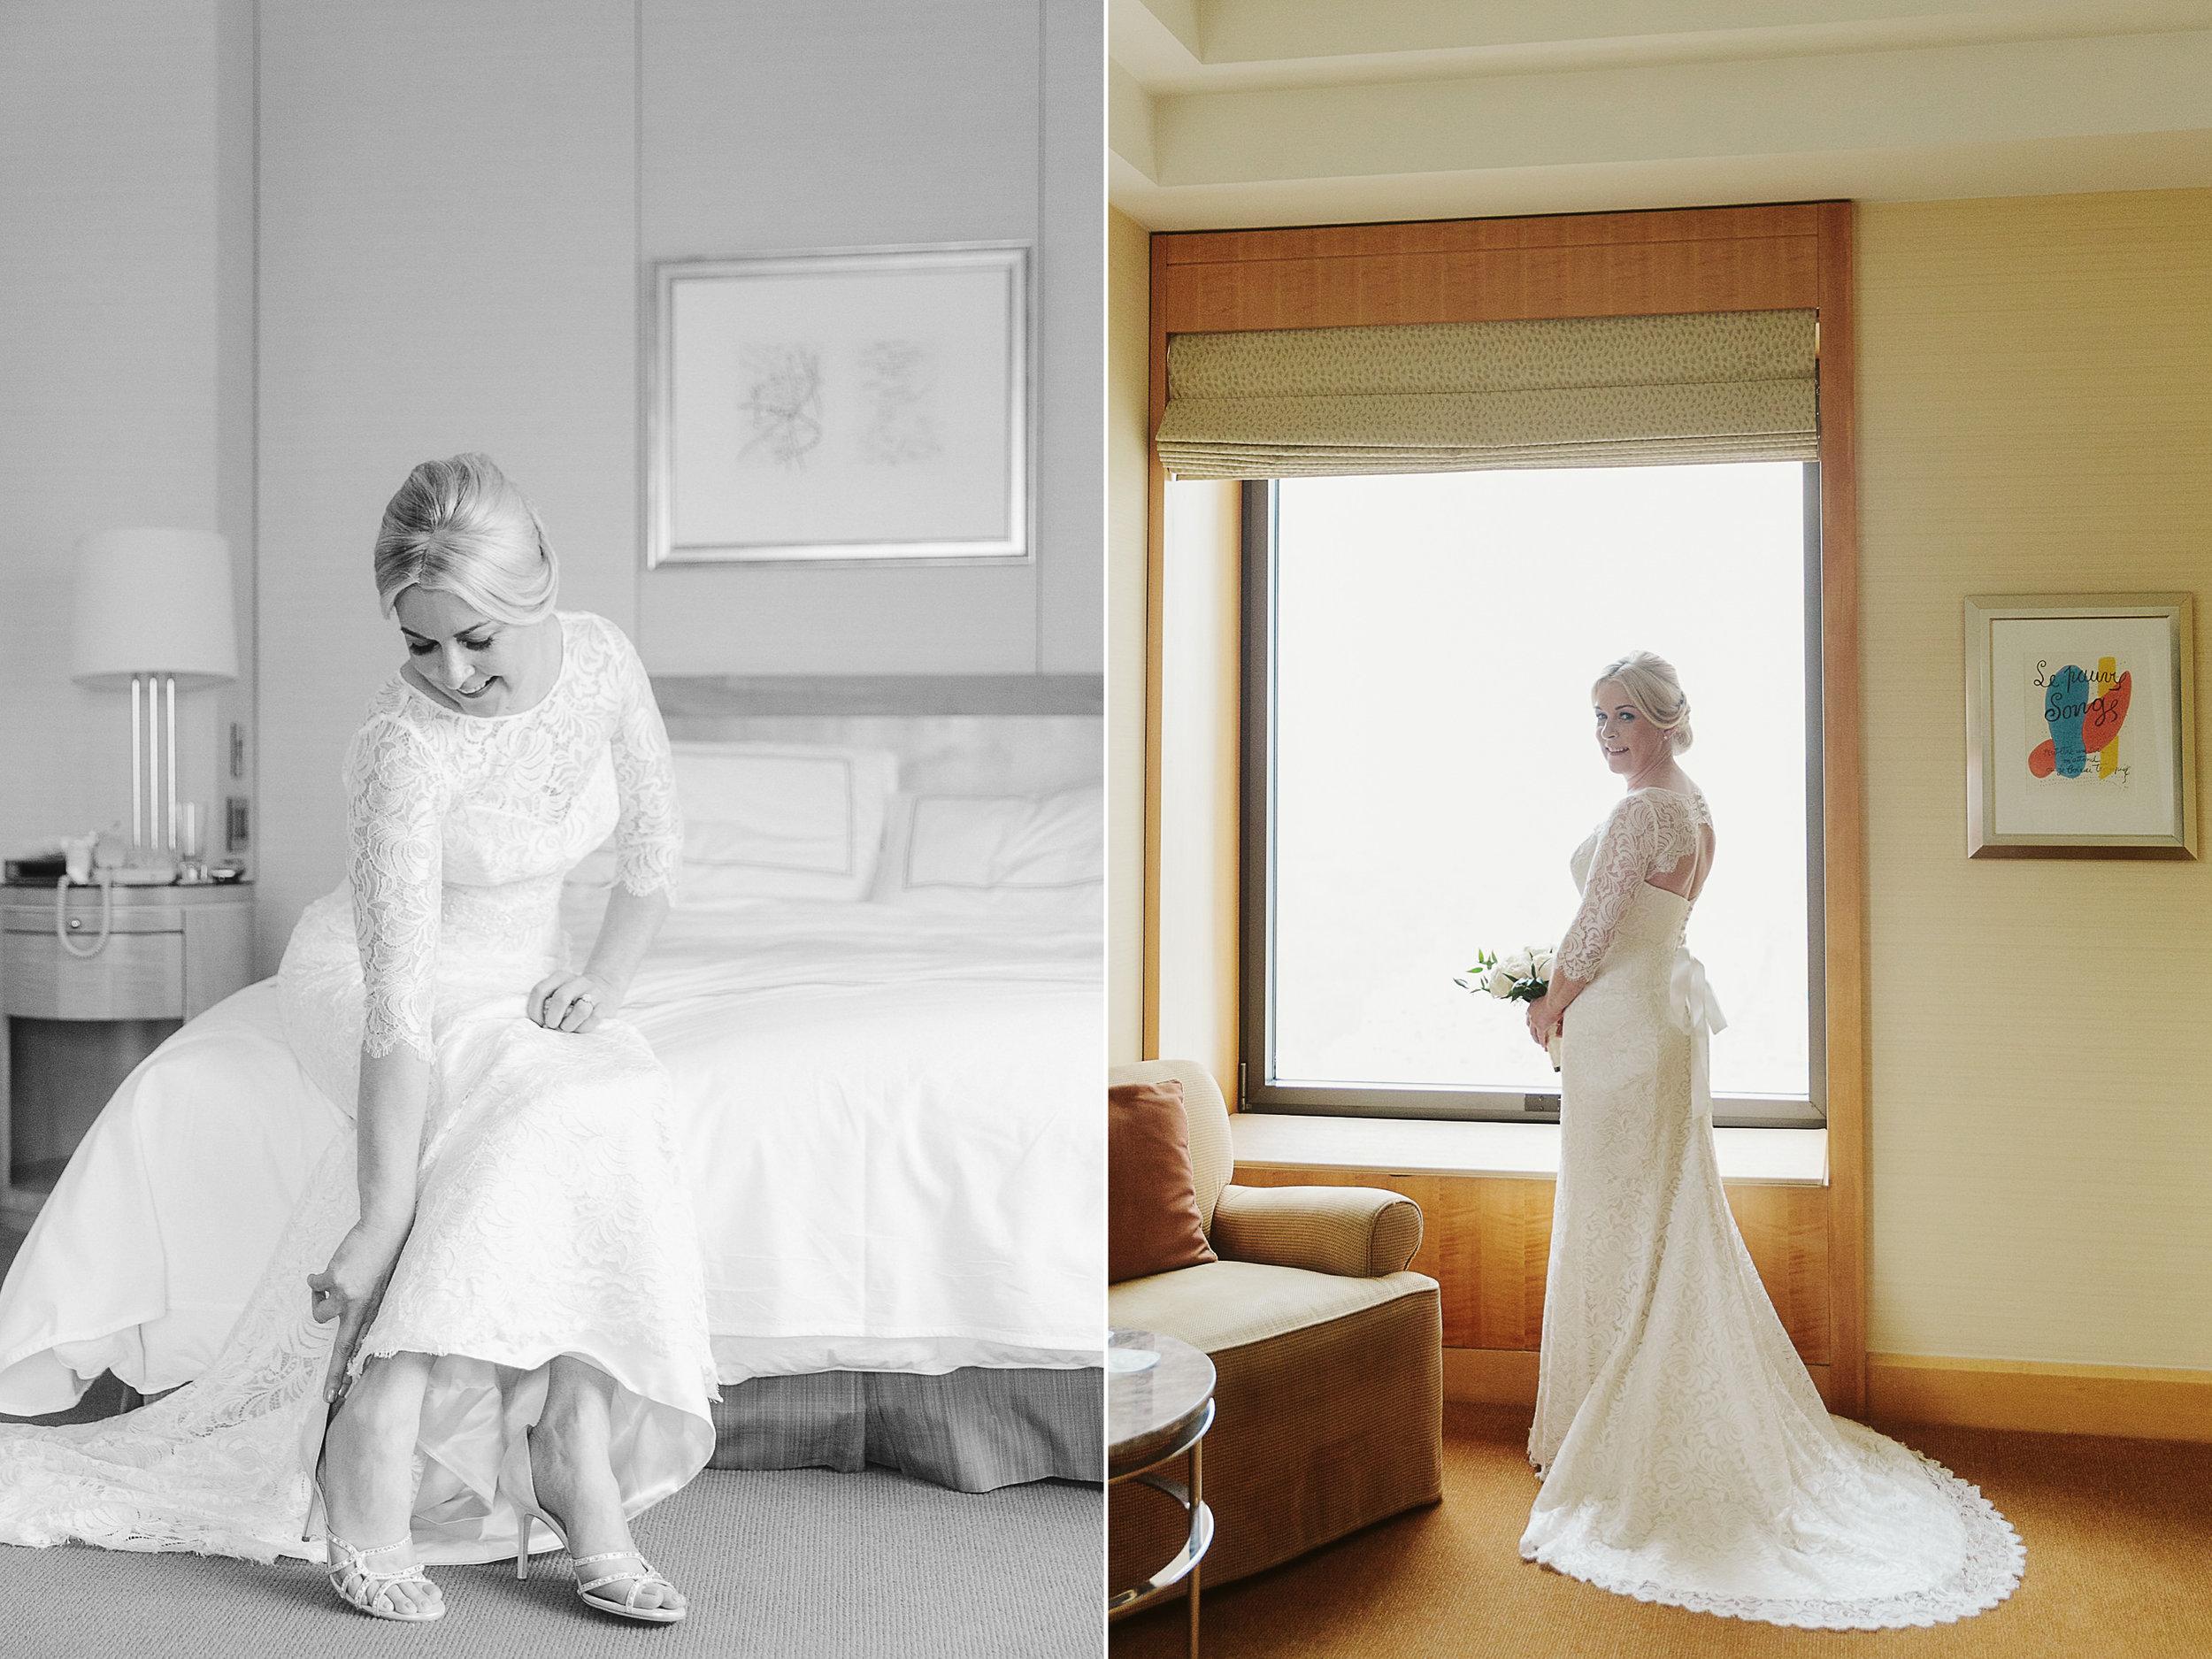 S&B_fourseasons_hotel_nyc_elopement_9.jpg